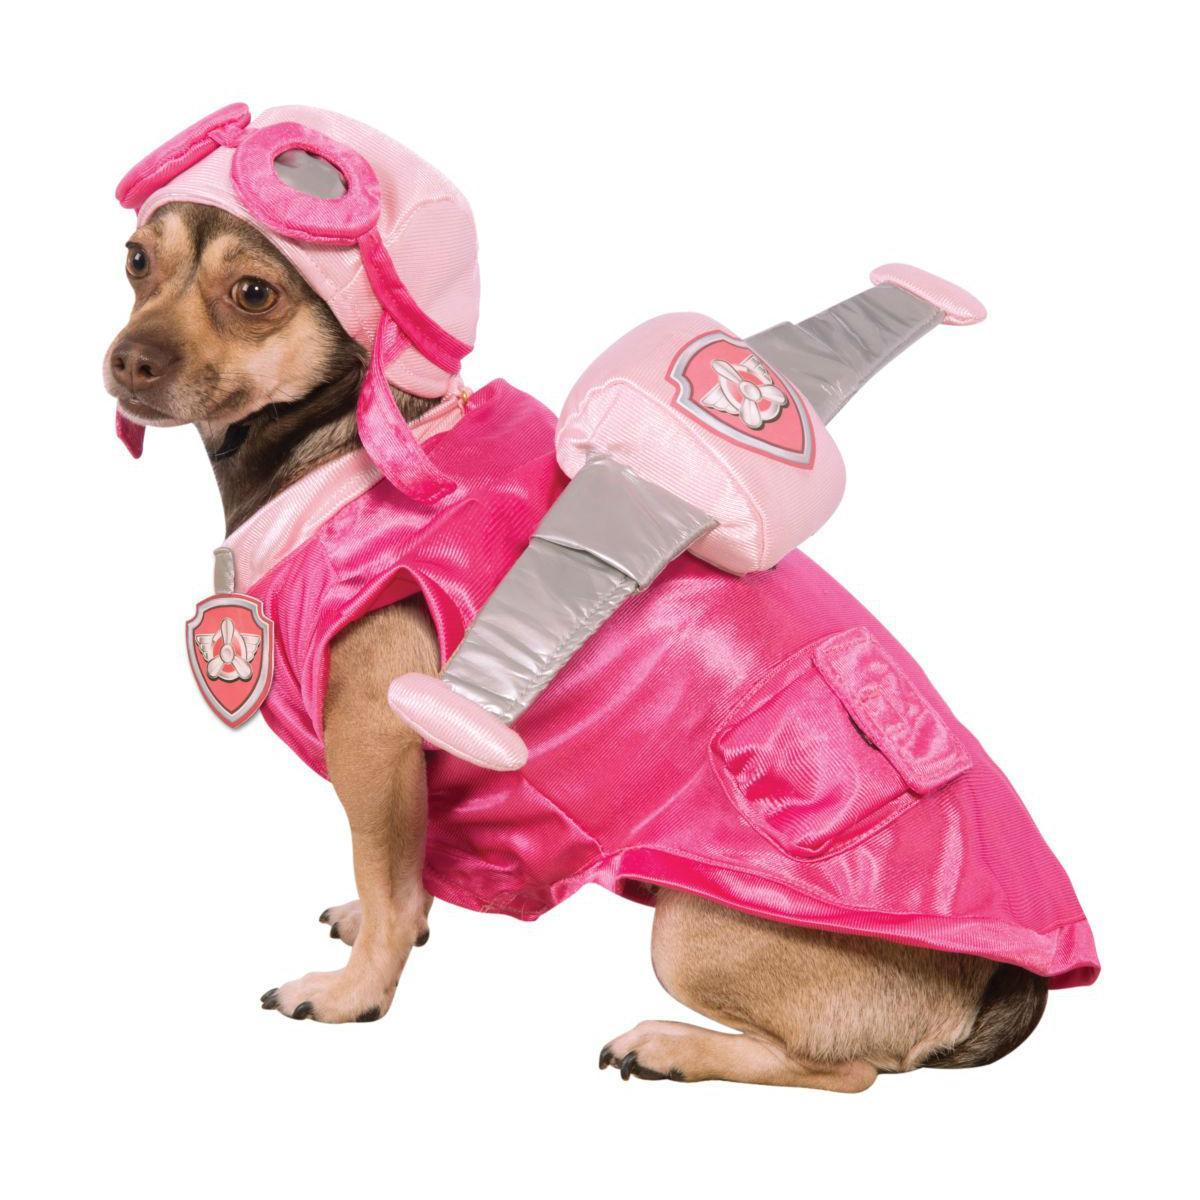 Paw Patrol Skye Dog Costume By Rubies Baxterboo